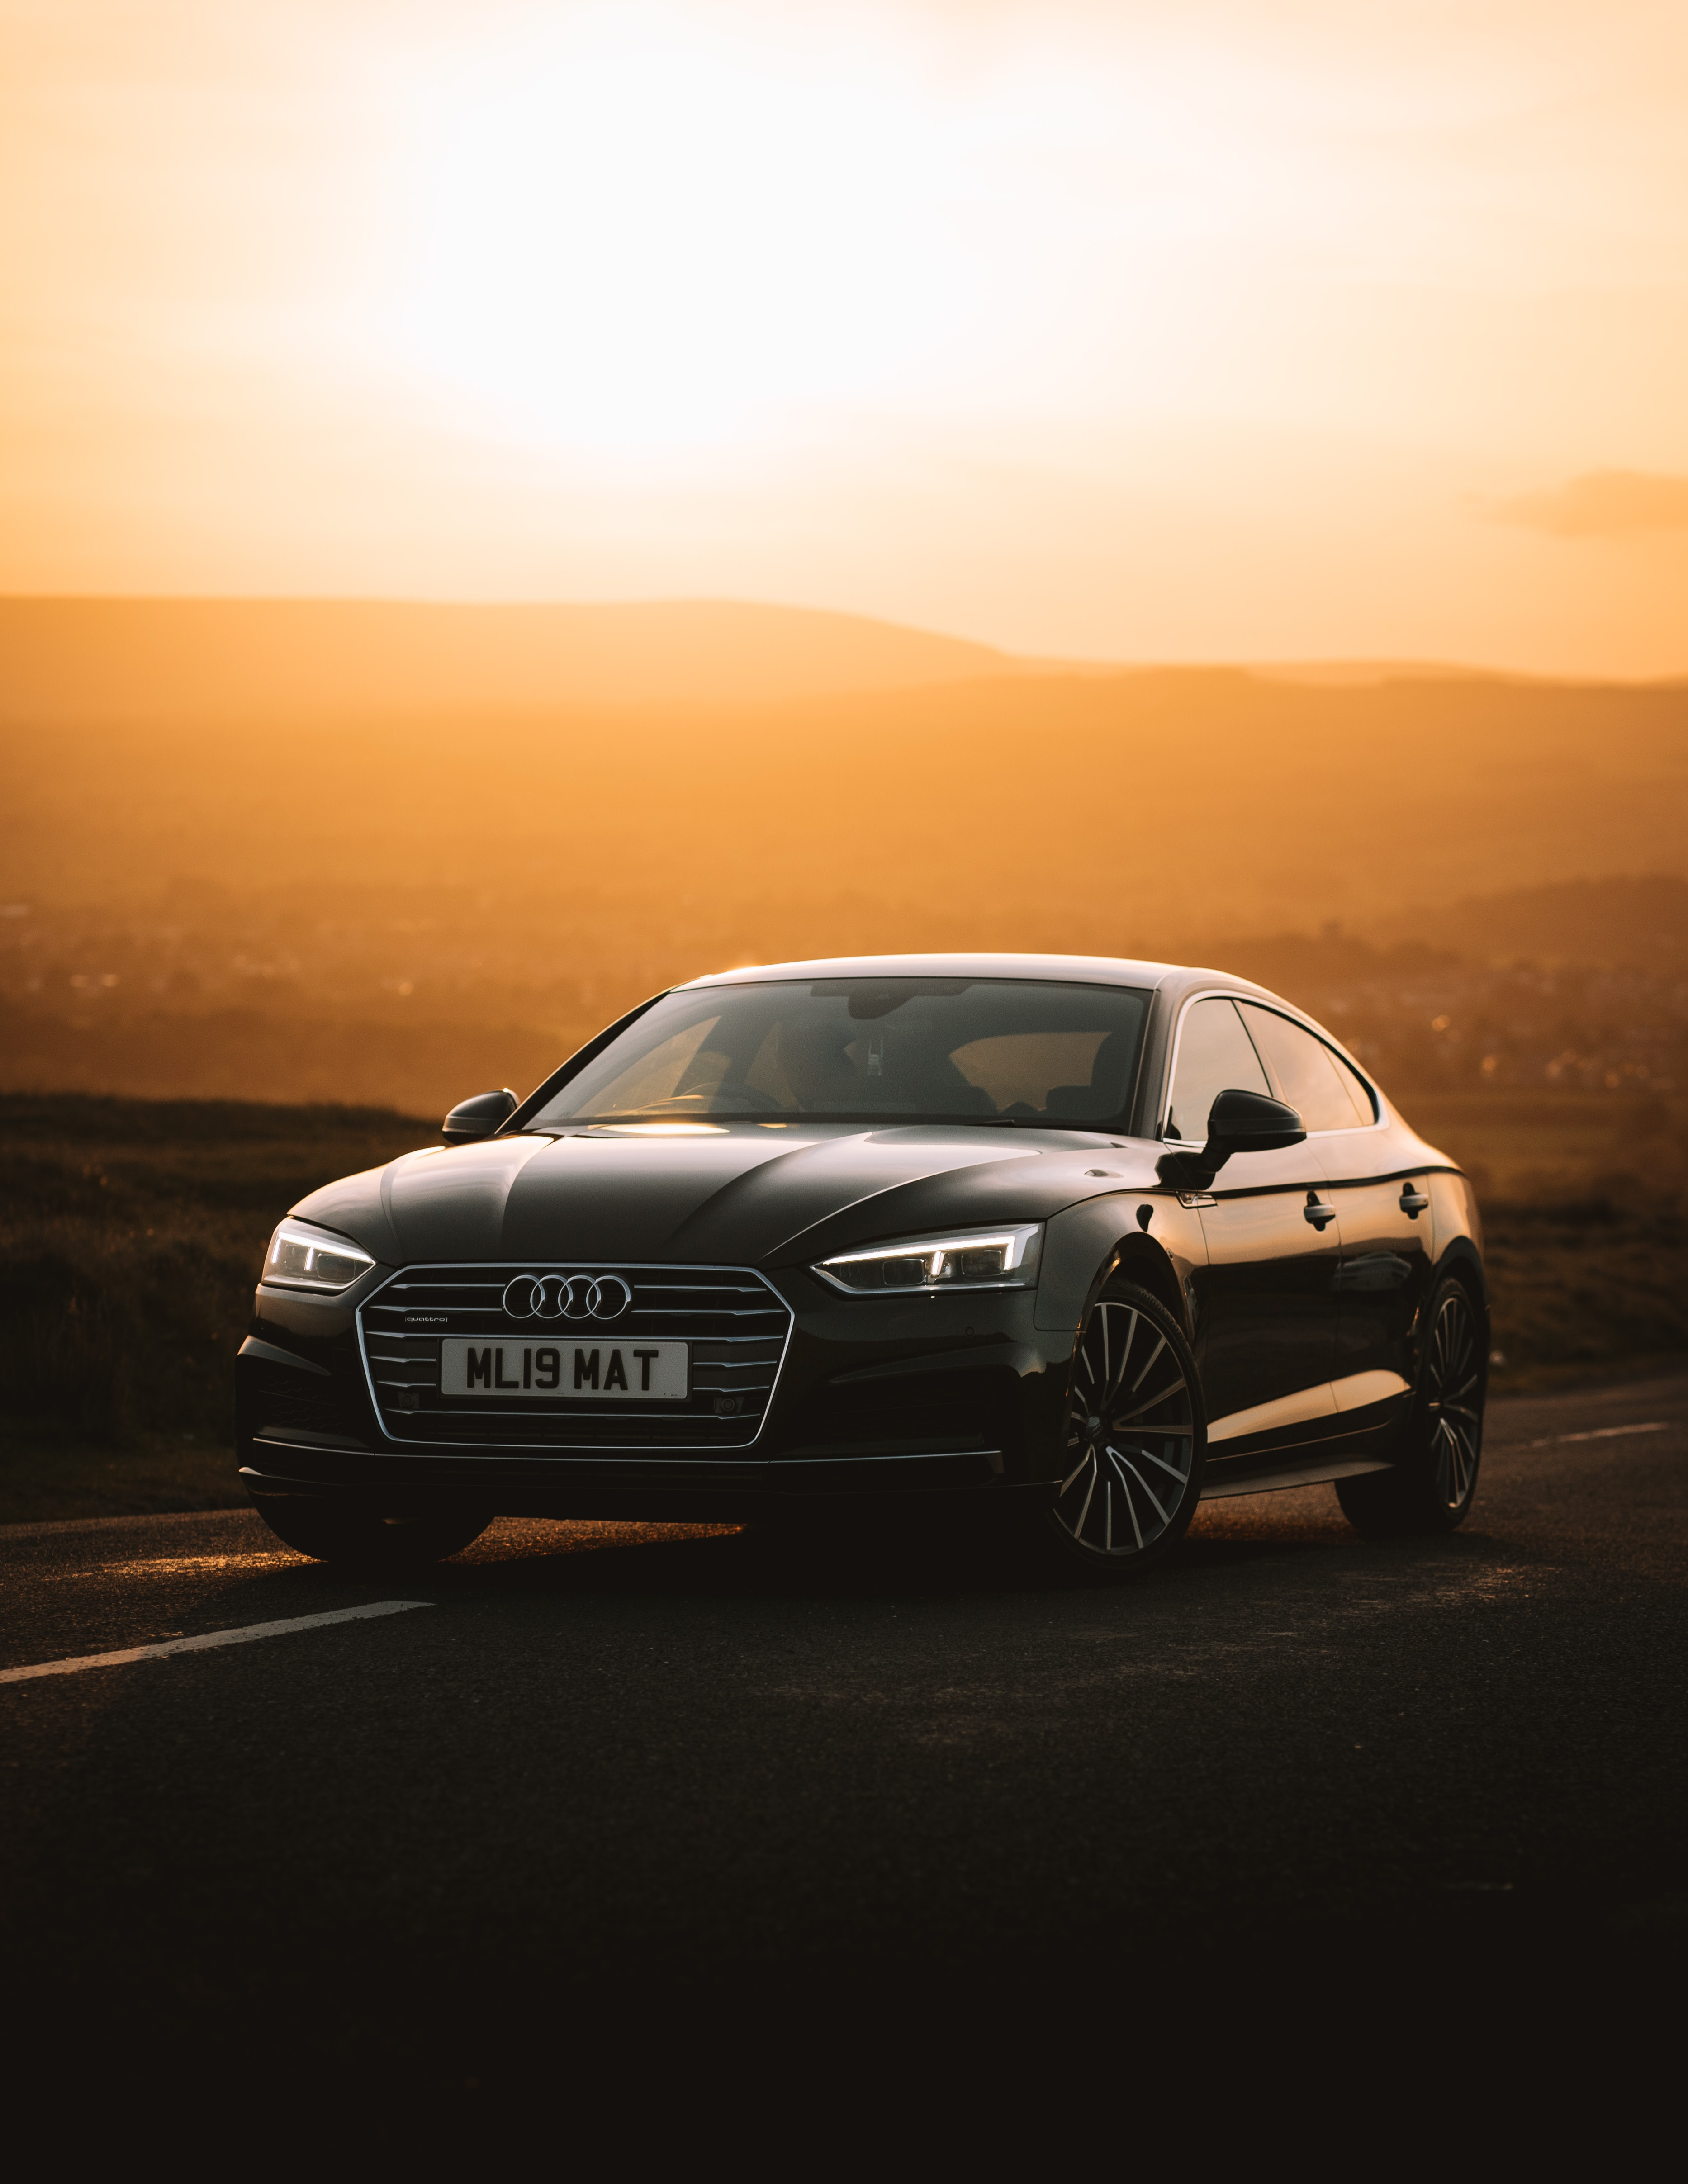 115564 Заставки и Обои Ауди (Audi) на телефон. Скачать Ауди (Audi), Audi A6, Закат, Тачки (Cars), Автомобиль, Вид Спереди картинки бесплатно